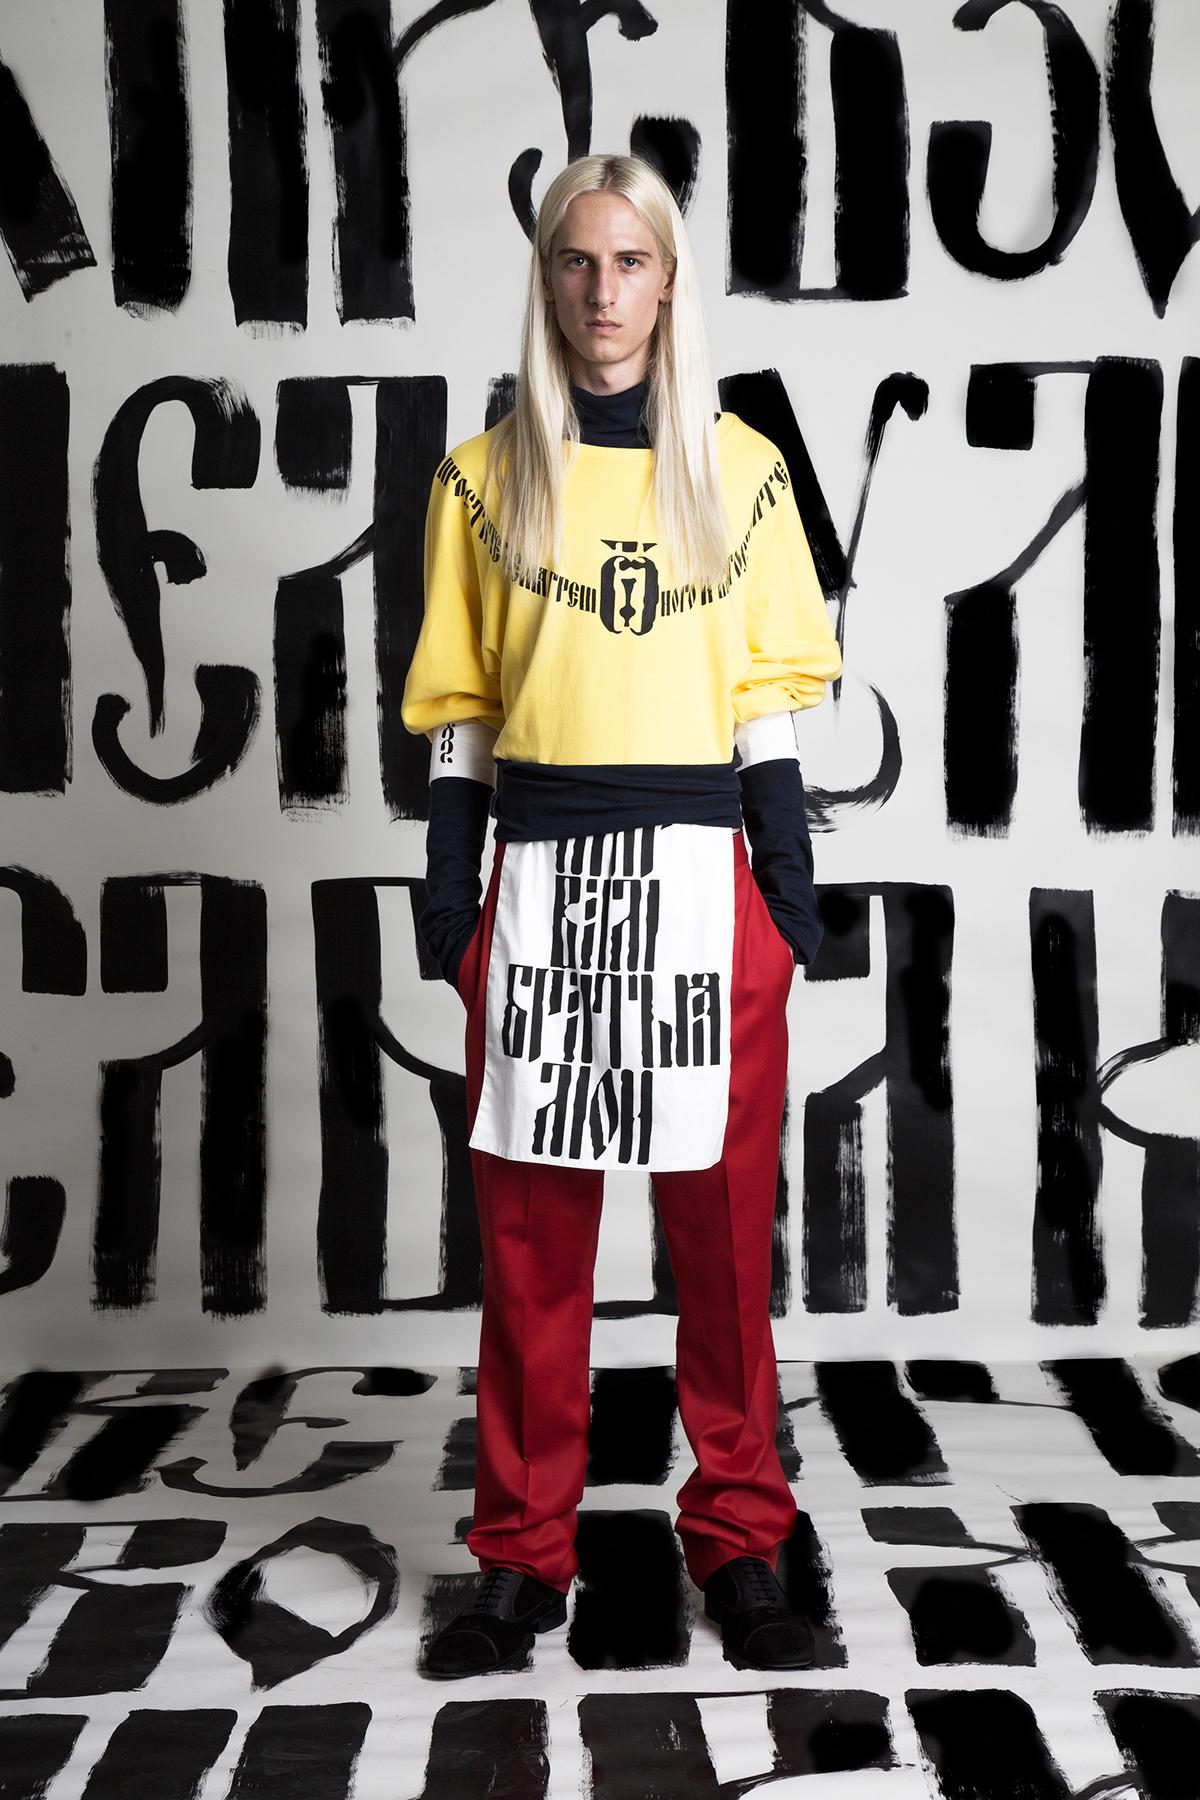 Menswear fashion design men's clothing Senior Collection skazanie Cyrillic alphabet  conceptual conceptual menswear screen printing watercolors wools Cashmere Fur